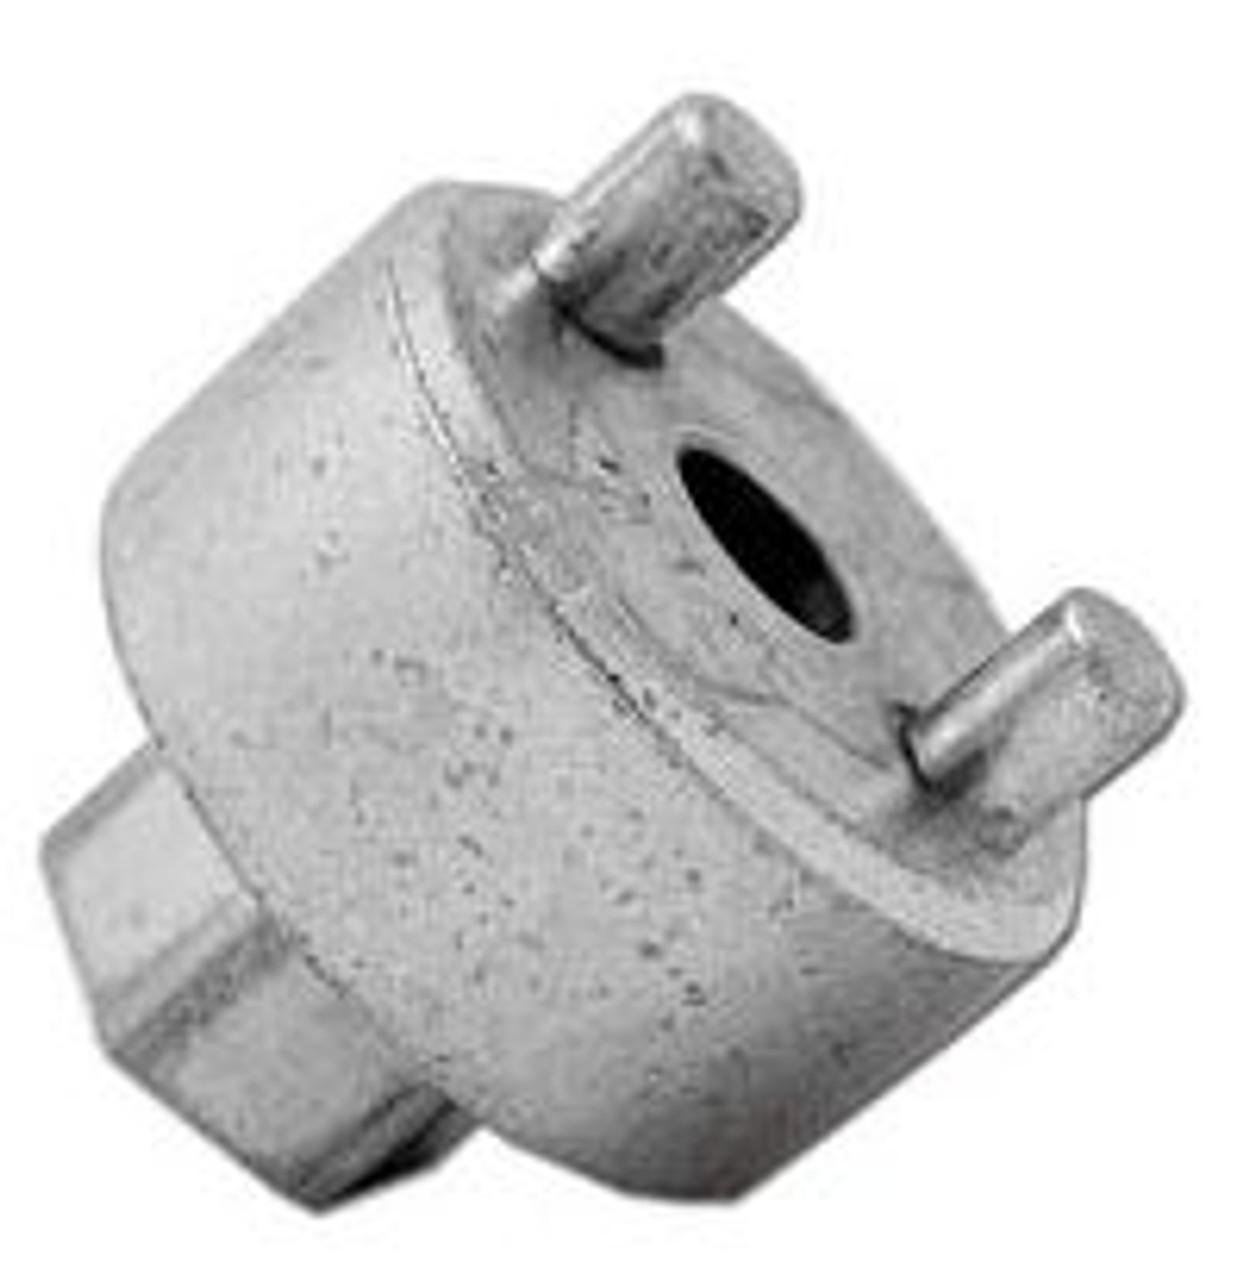 Husqvarna 36, 37, 136, 137, 141, 142 Clutch Puller Removal Tool New